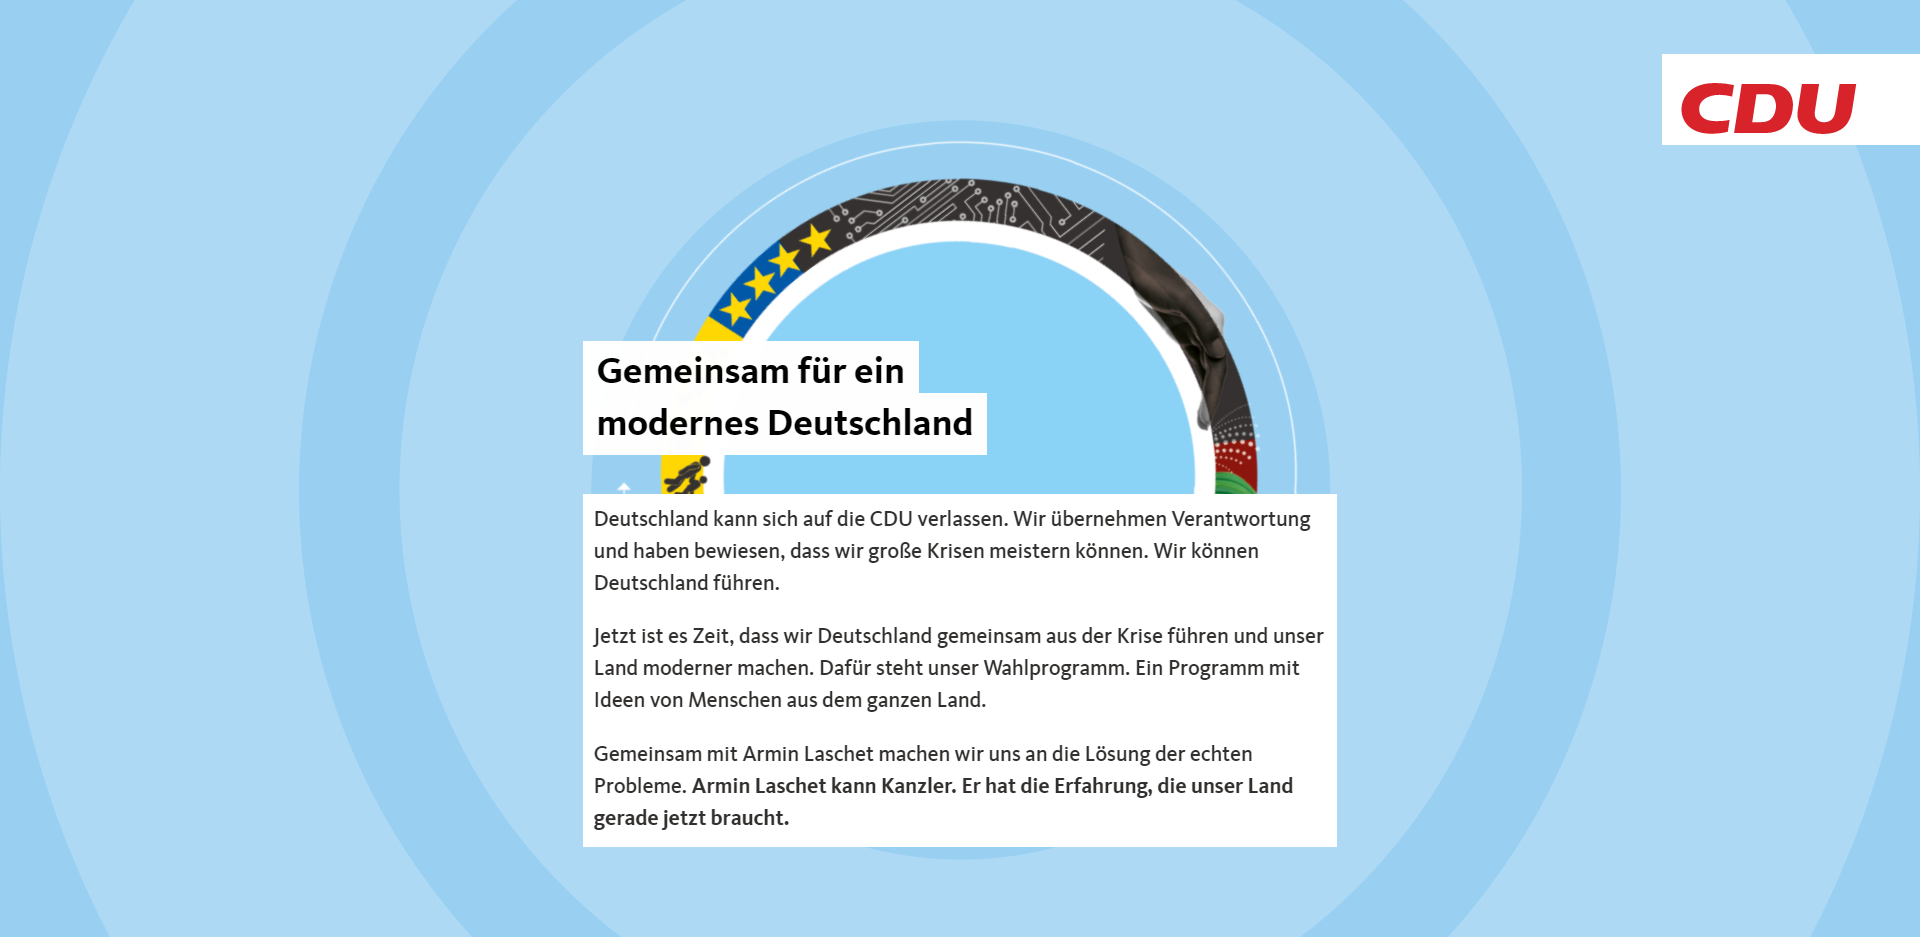 CDU Wahlprogramm Bundestagswahl 2021